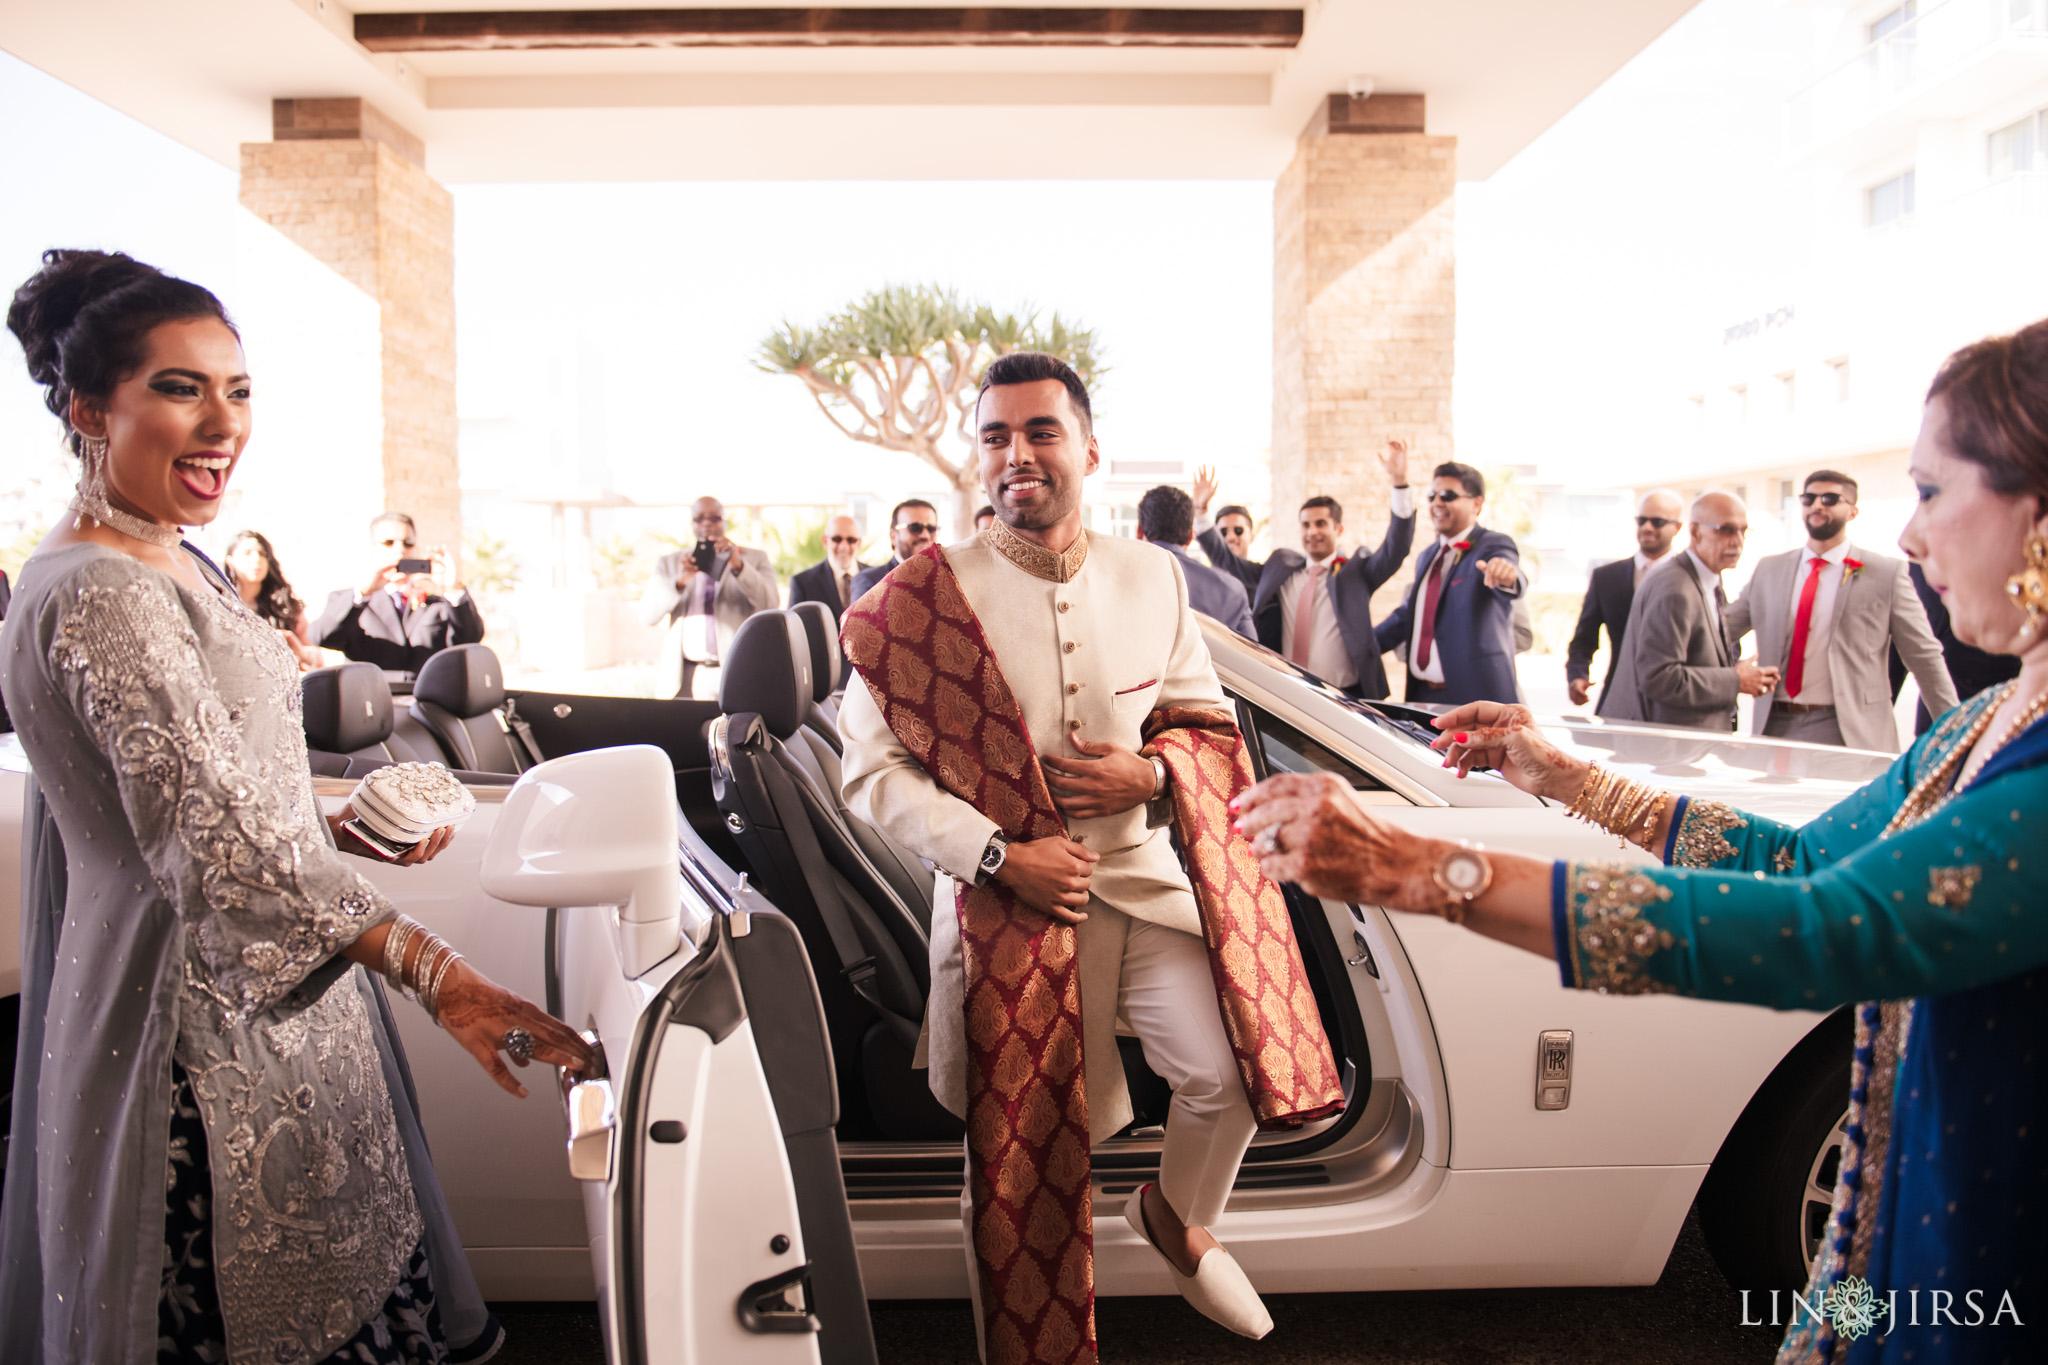 014 pasea hotel huntington beach pakistani muslim wedding photography